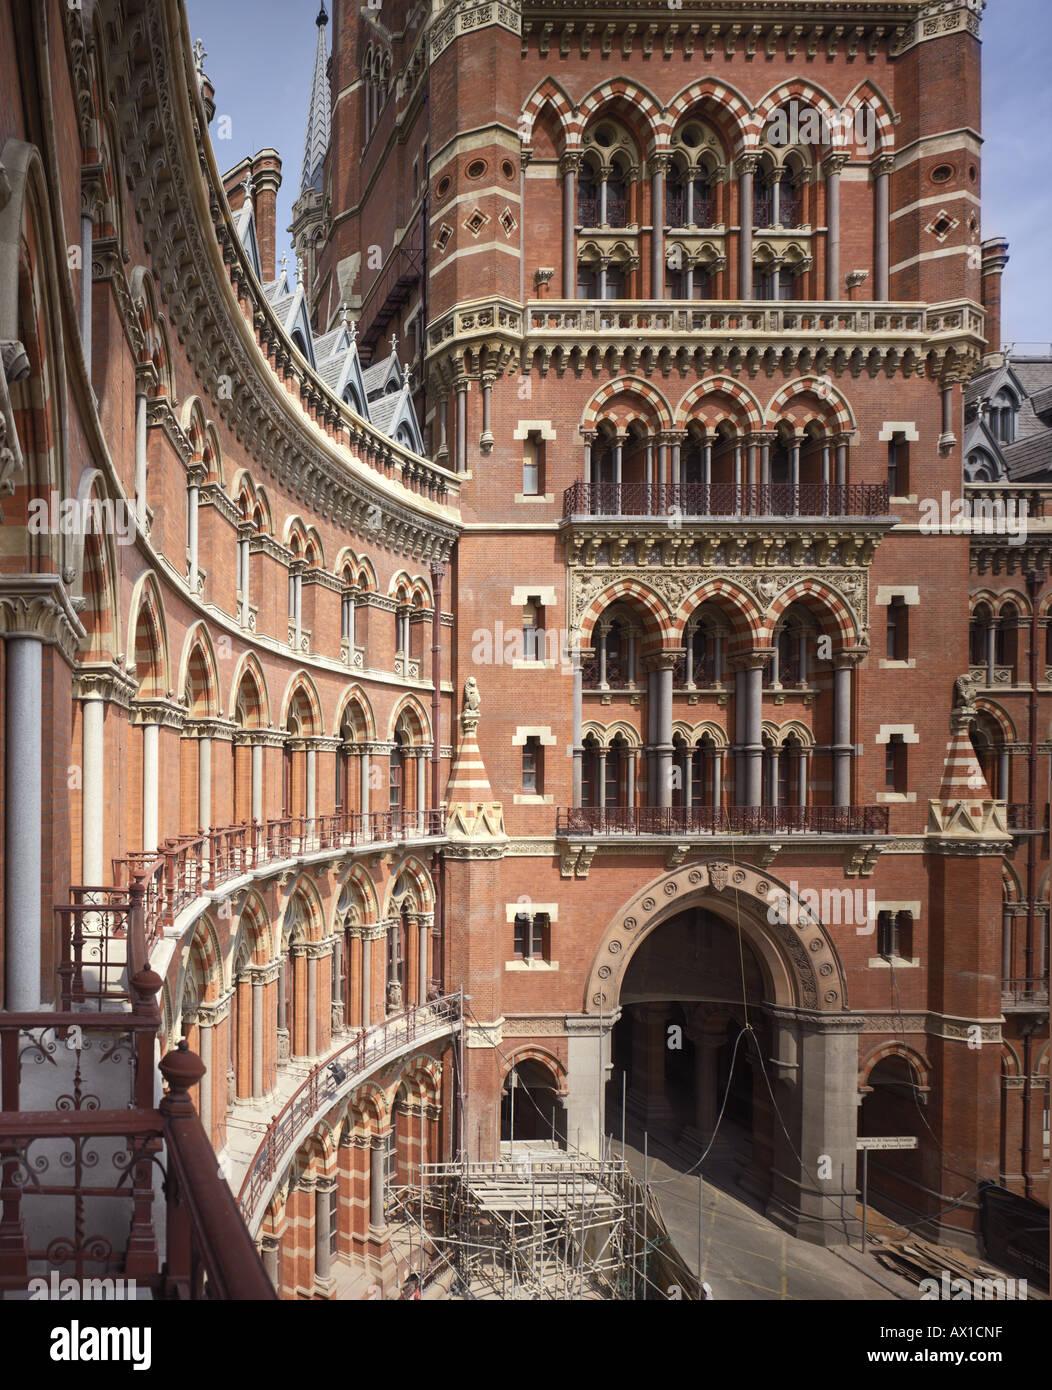 ST. PANCRAS STATION AND HOTEL, LONDON, UK - Stock Image